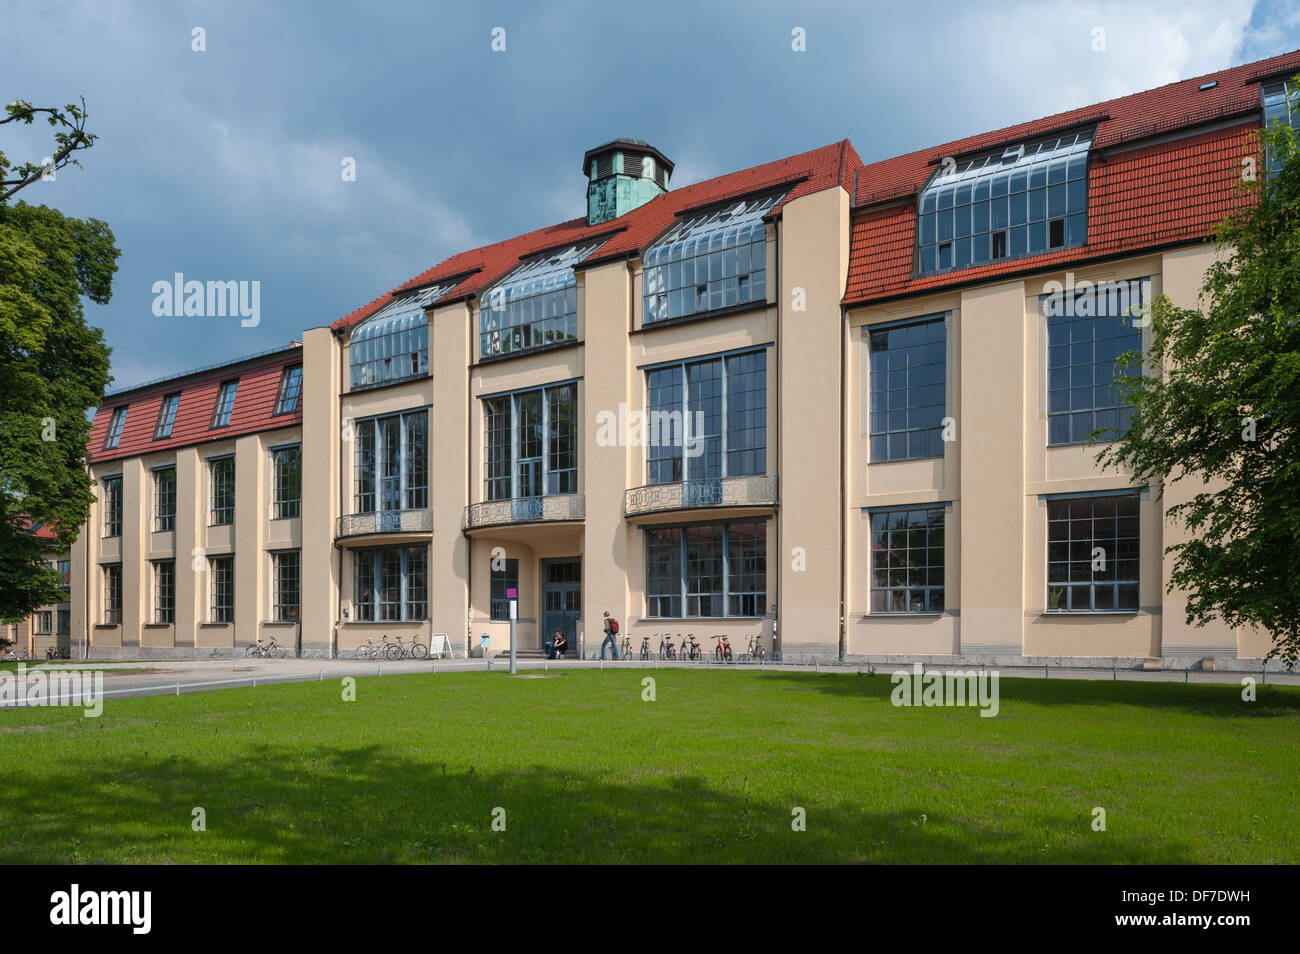 Main Building Of The Bauhaus University Weimar Former Art School Designed After